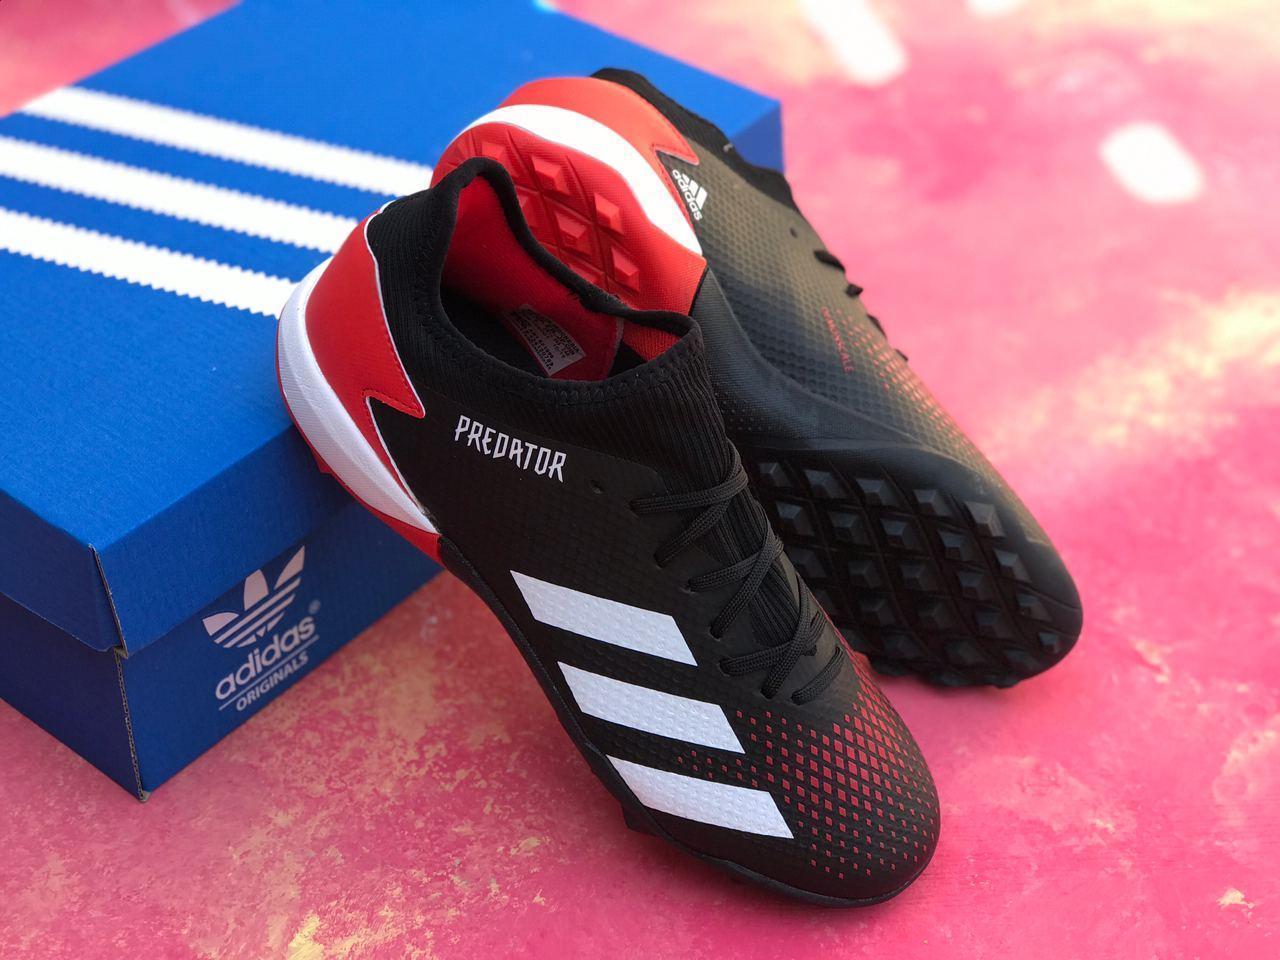 Сороконожки Adidas PREDATOR MUTATOR 20.3/ сороконожки  адидас/ футбольная обувь